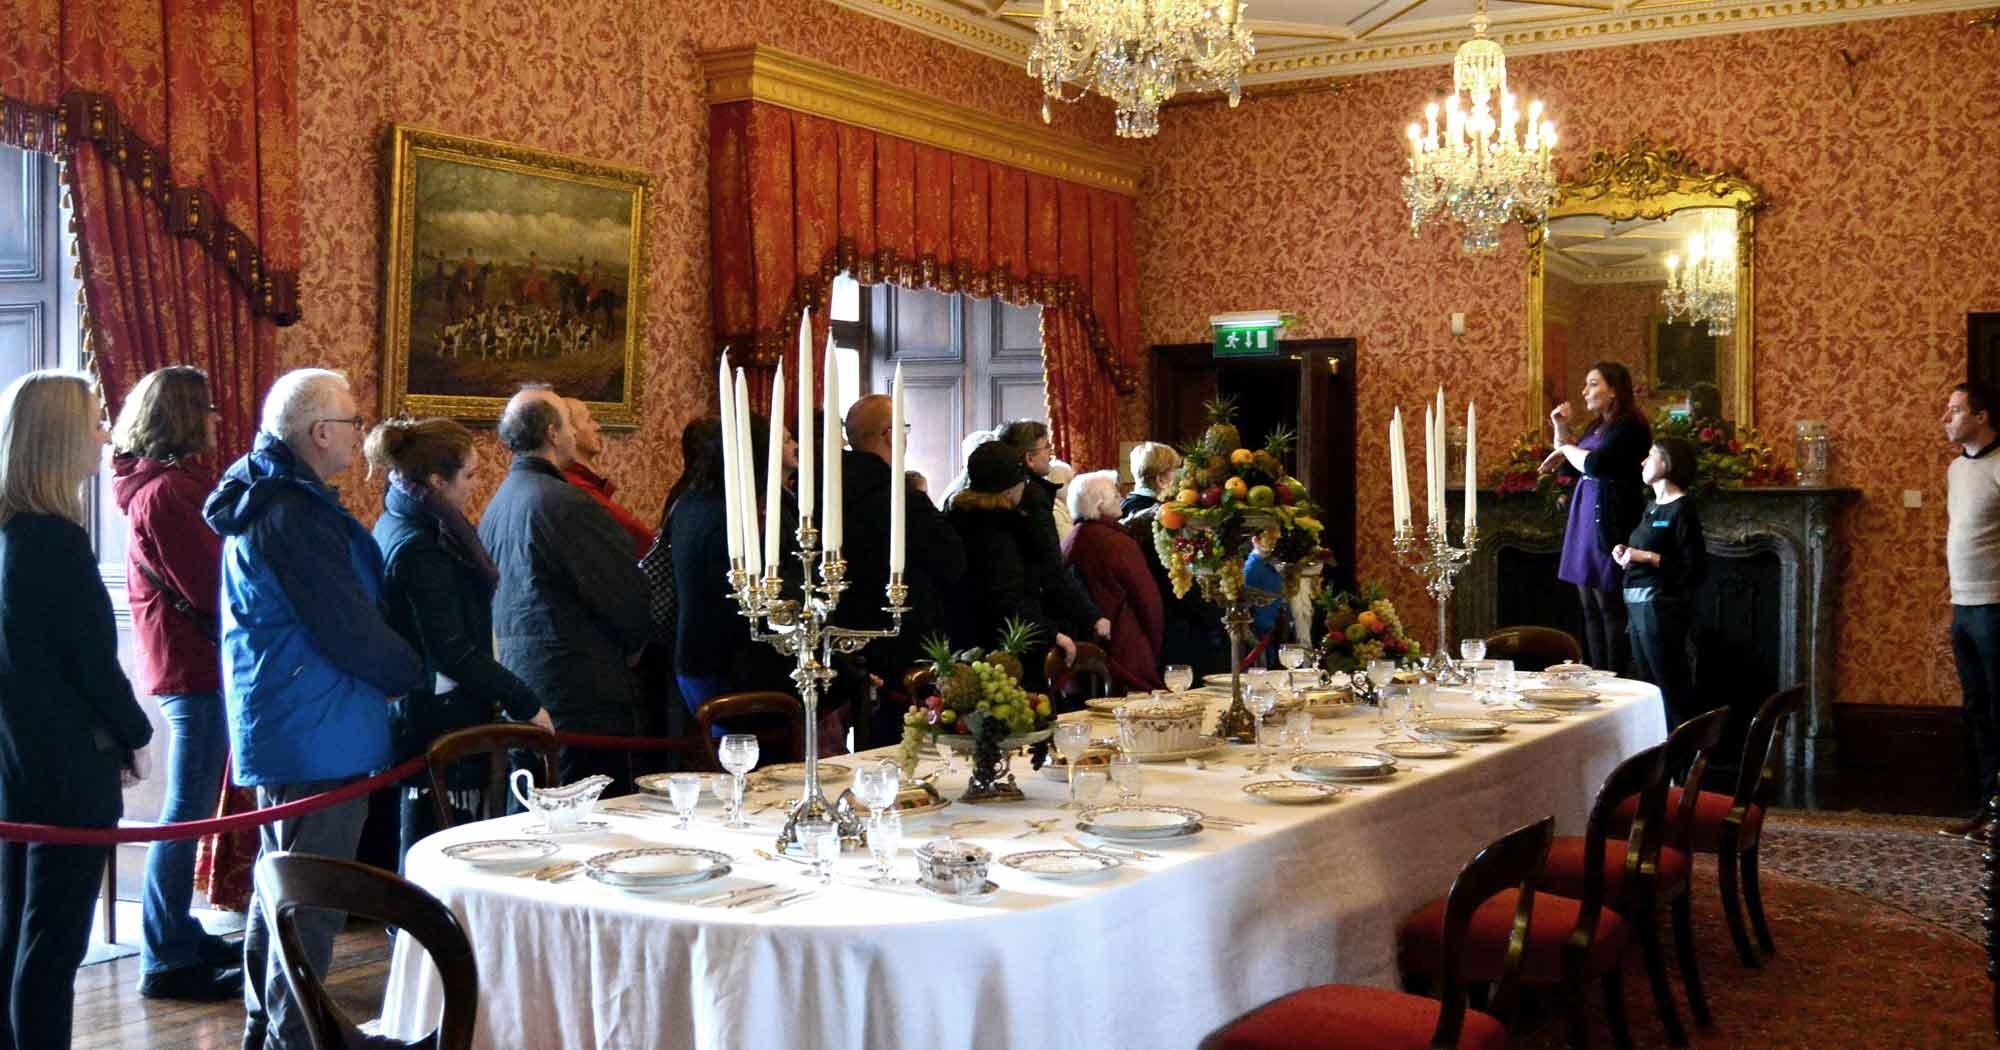 ISL at Kilkenny Castle